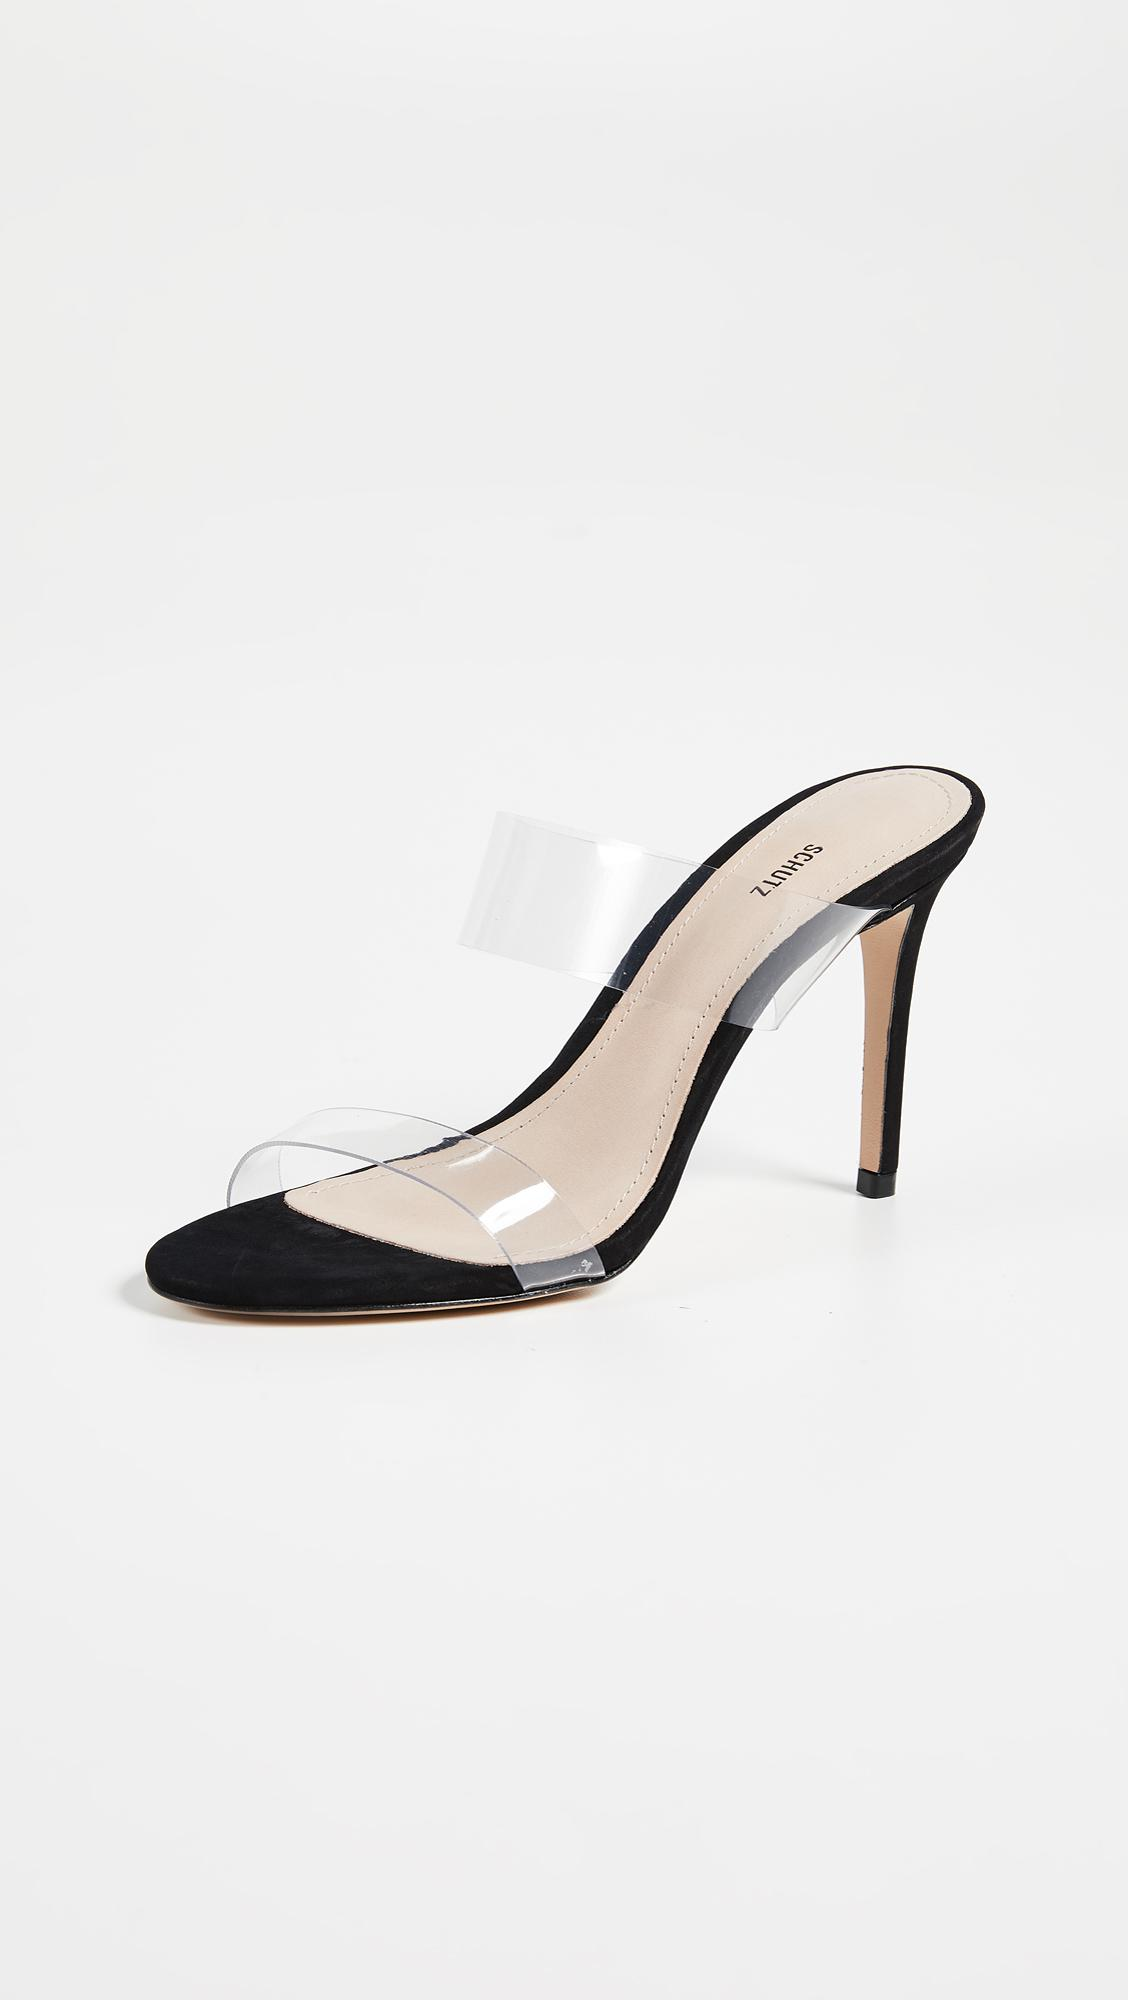 61a33b37a3e Schutz Ariella Strappy Sandals in Black - Lyst